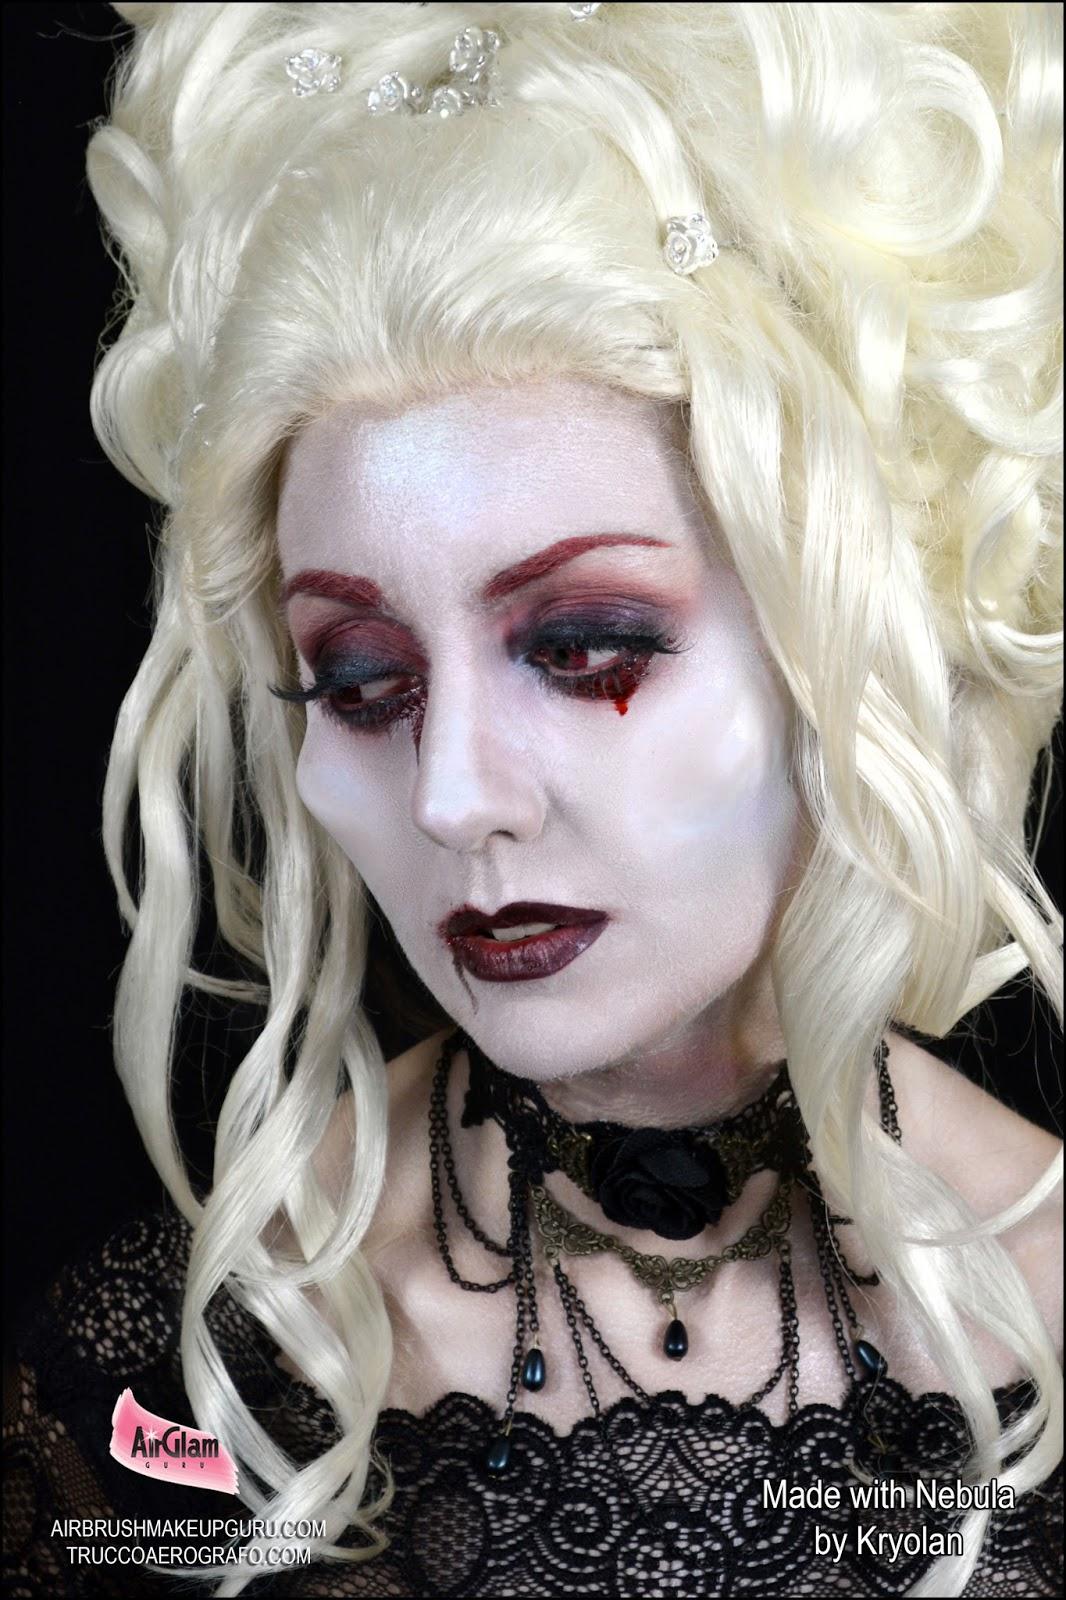 The Airbrush Makeup Guru: October 2016